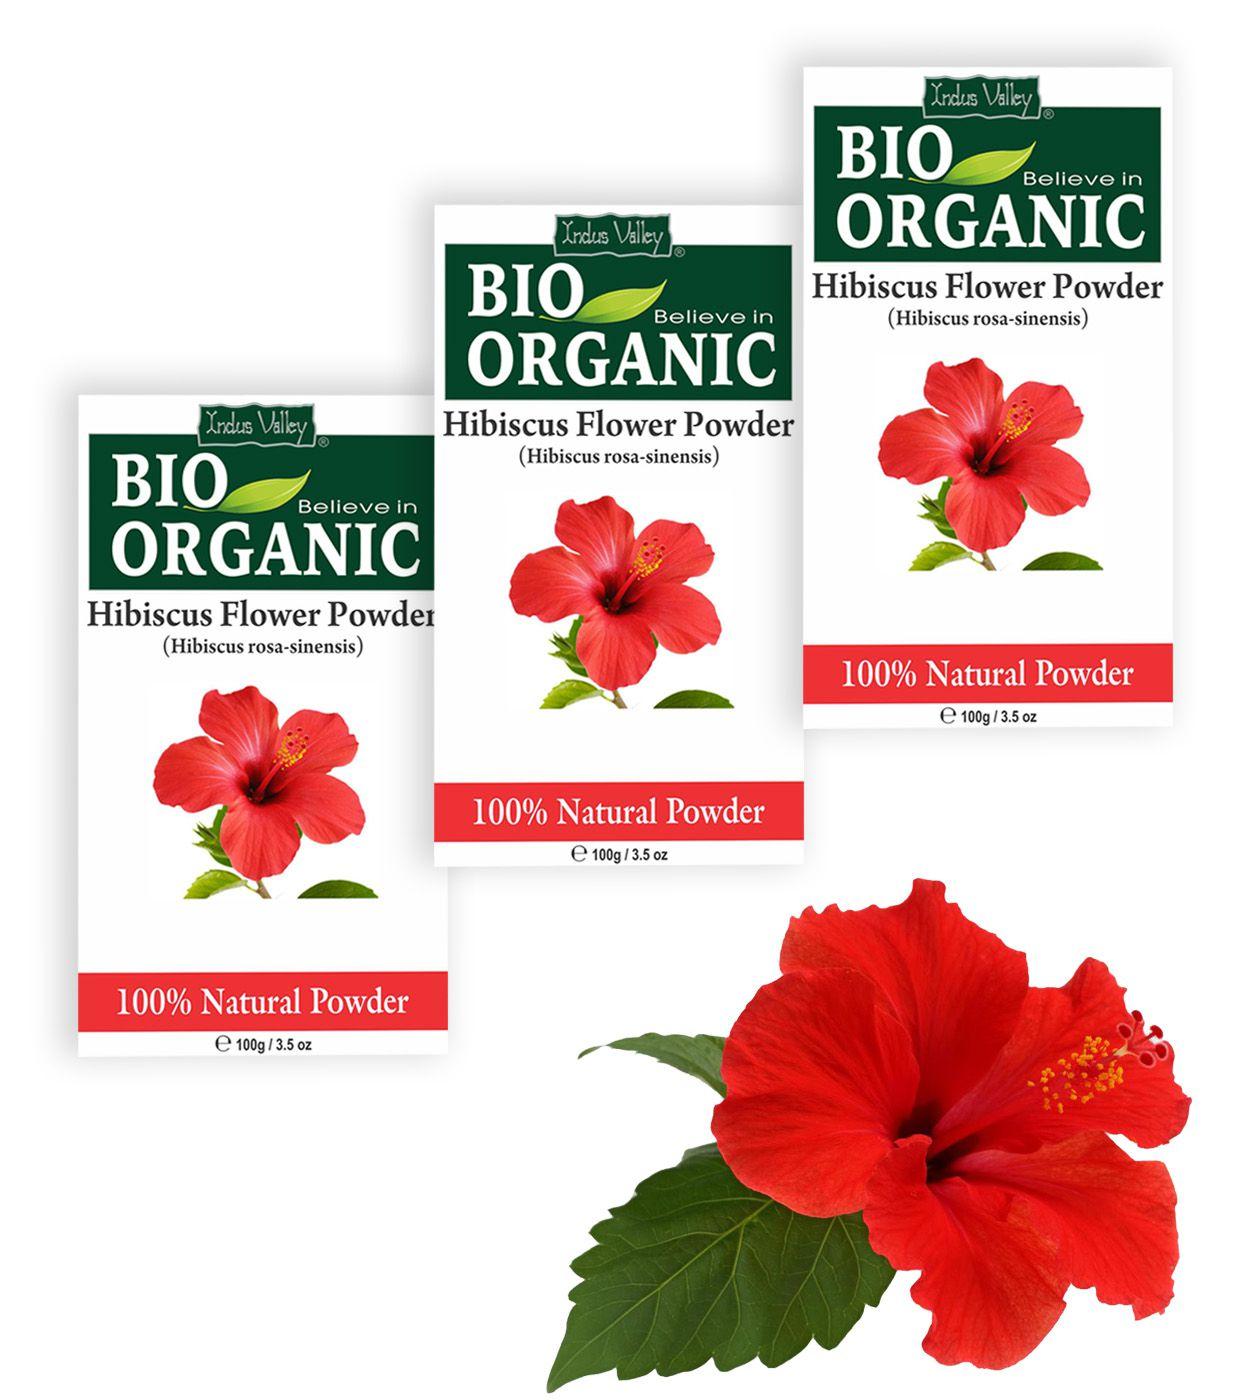 Indus valley bio organic hibiscus powder hair scalp treatment 300 gm indus valley bio organic hibiscus powder hair scalp treatment 300 gm pack of 3 izmirmasajfo